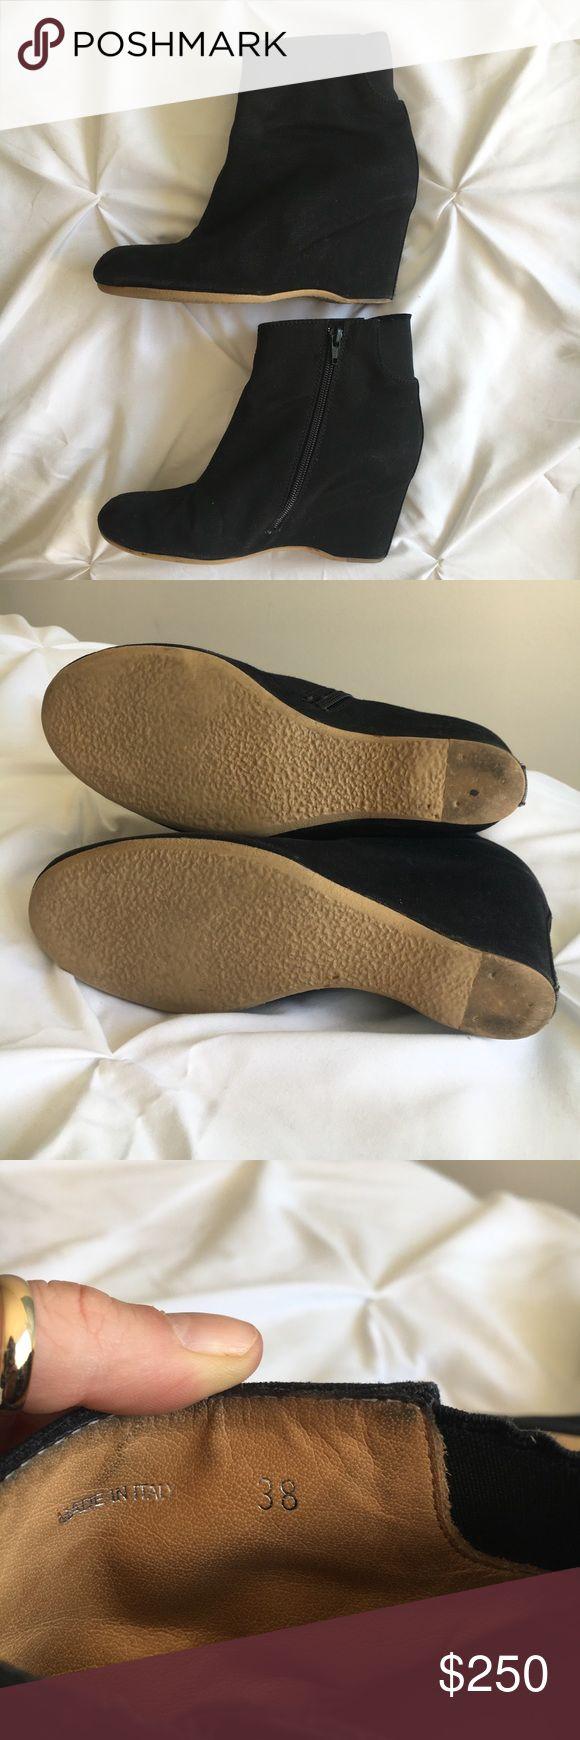 Mason Martin Margiela wedge booties Black khaki wedge bootie. Very comfortable, zipper on inside of boot, leather inside. Mason Martin Margiela Shoes Ankle Boots & Booties